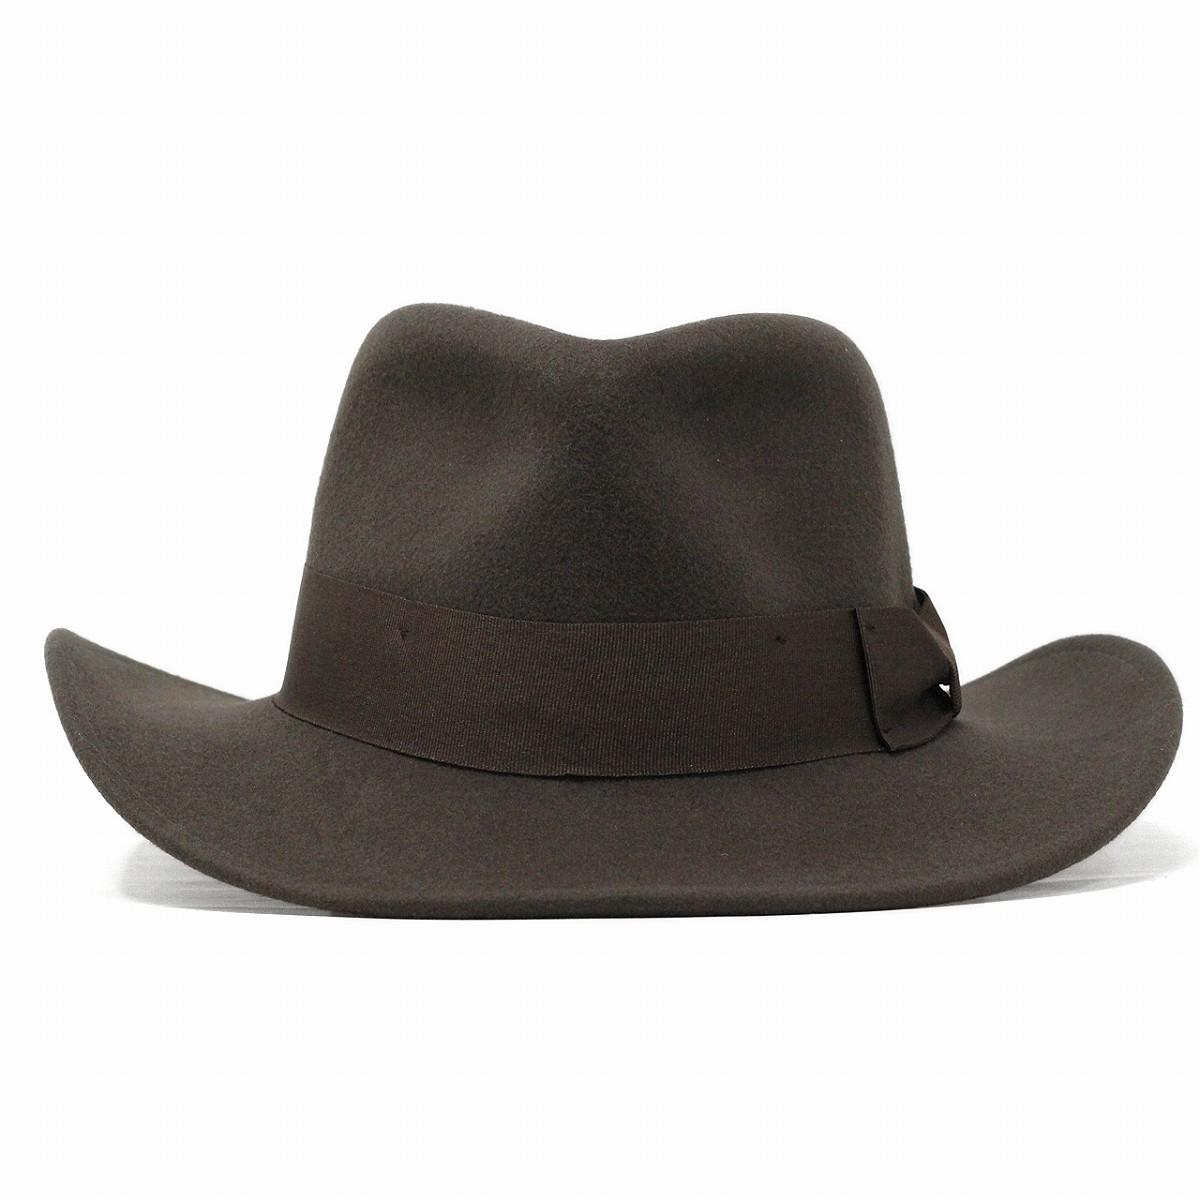 ELEHELM HAT STORE  Wide brim Hat hats Indiana Jones wool felt Hat men s  imported INDIANA JONES wild autumn winter fashion   Brown Brown  47372e0218f5